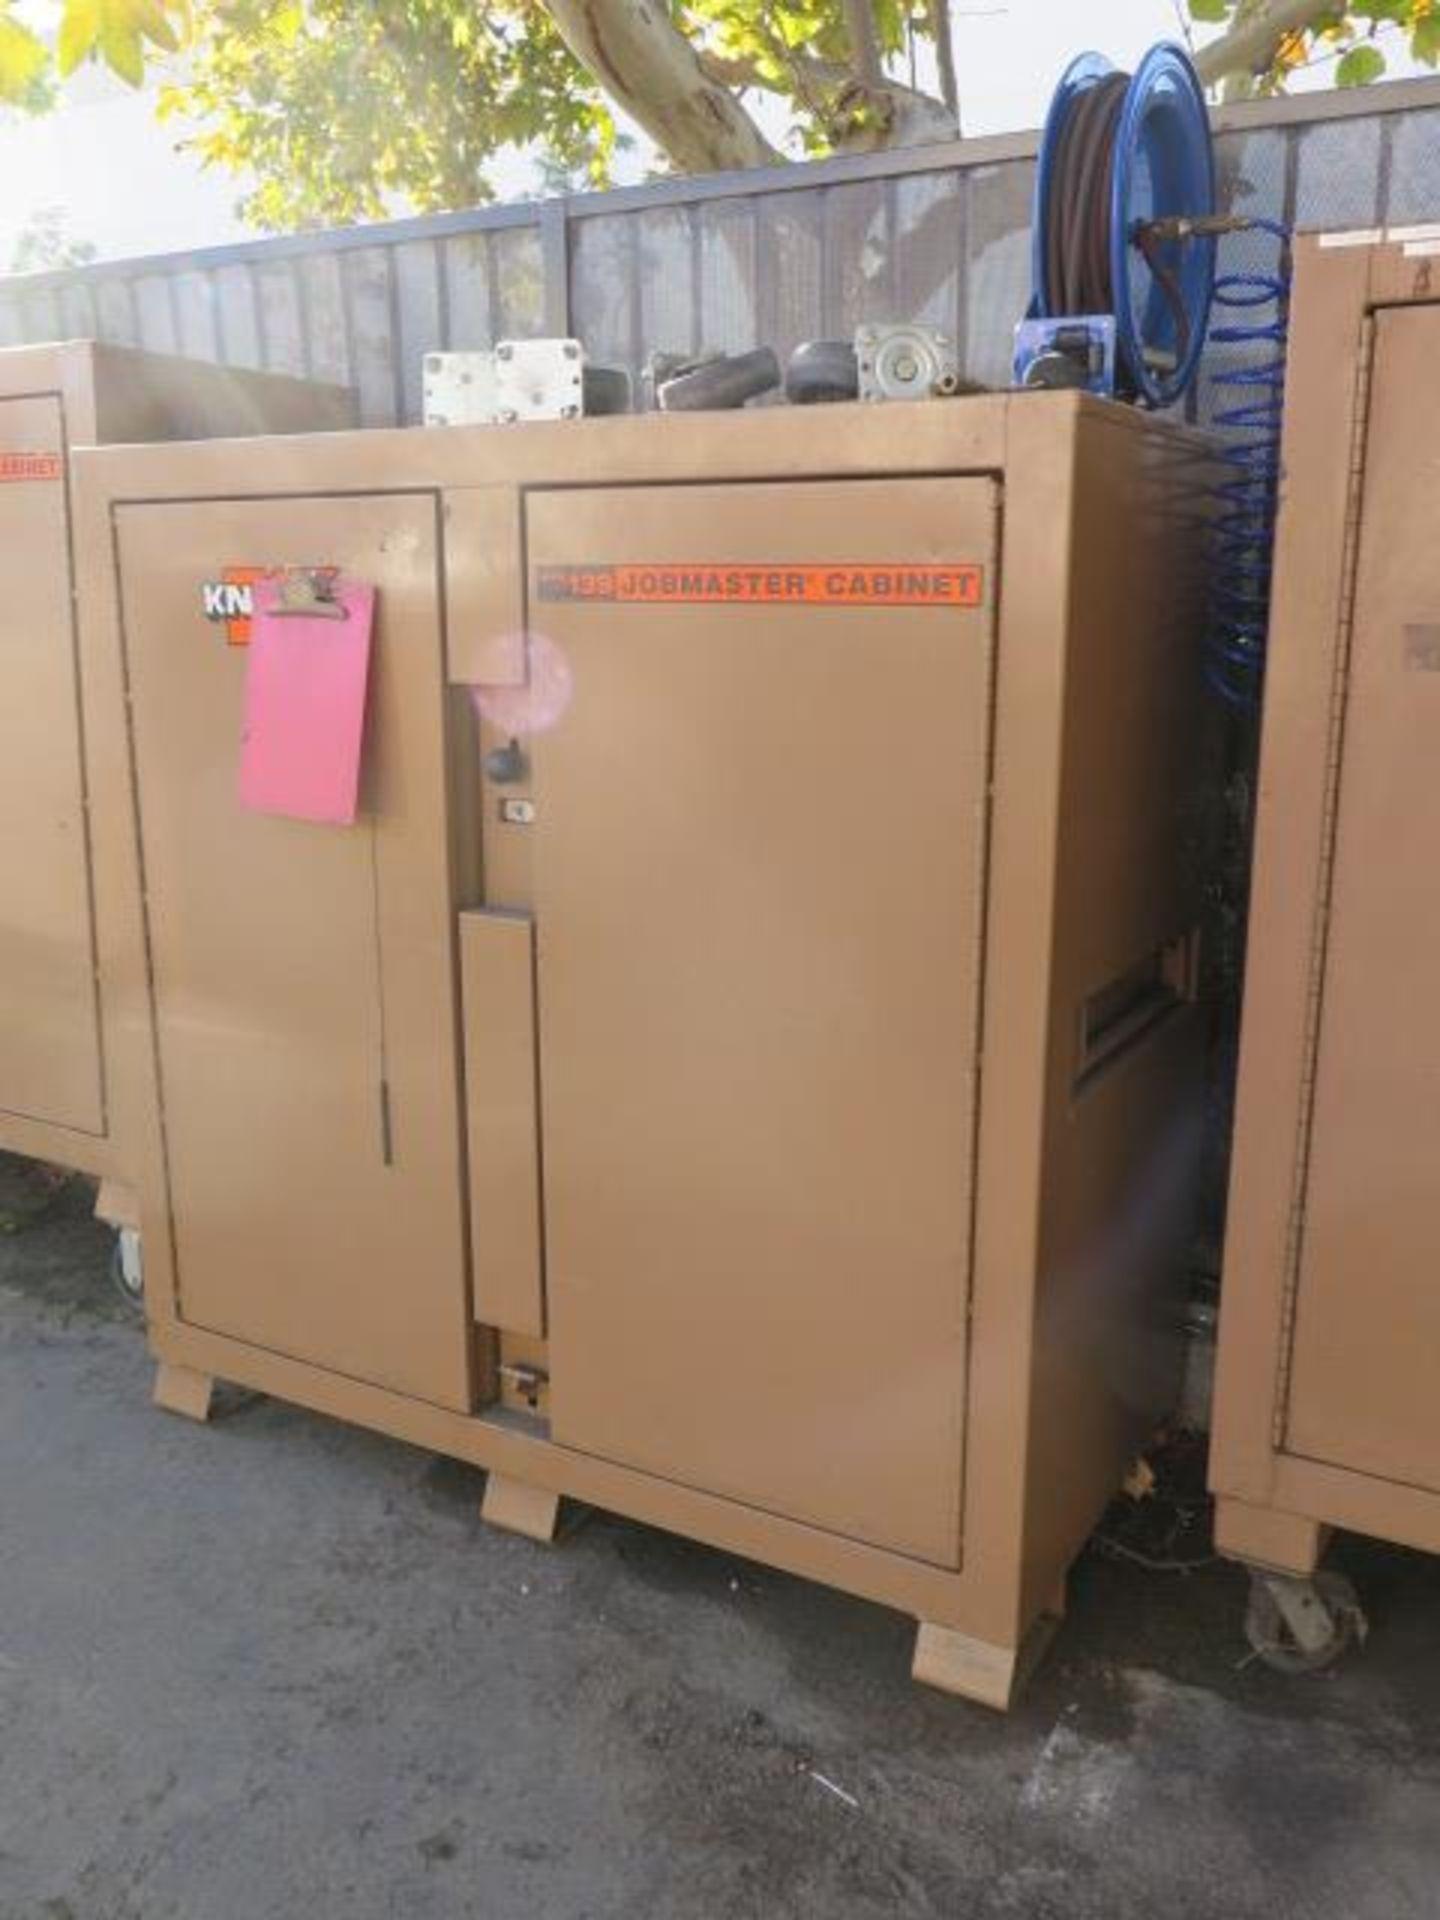 Knaack mdl. 139 Jobmaster Job Box (SOLD AS-IS - NO WARRANTY) - Image 2 of 17